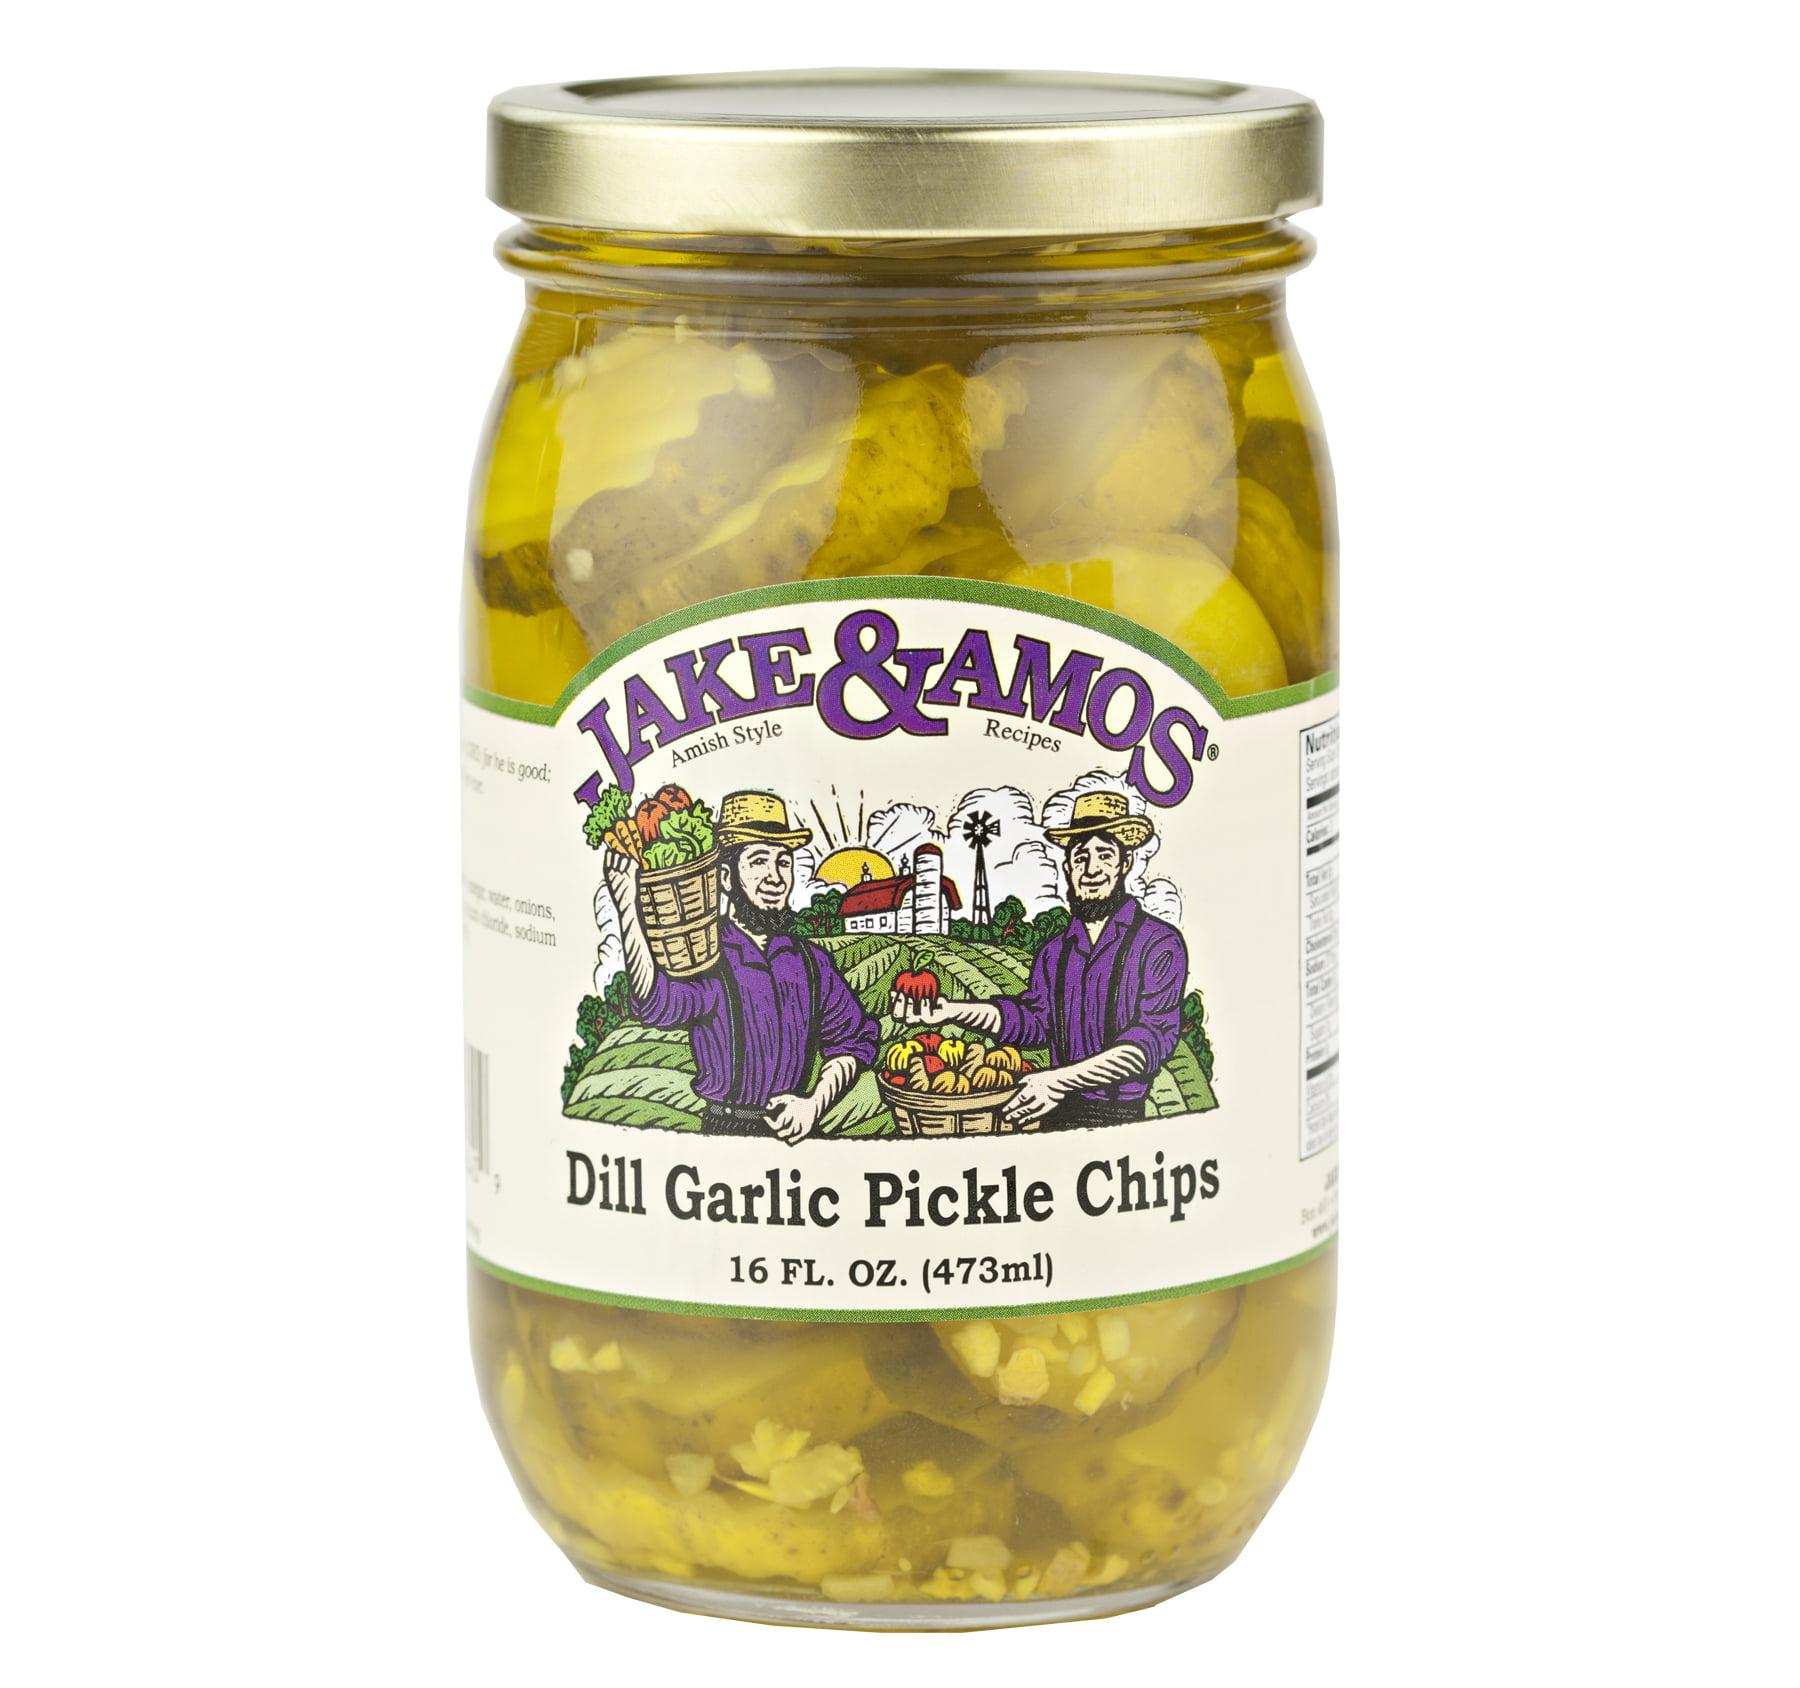 Jake & Amos Dill Garlic Pickle Chips 16 oz. (3 Jars)